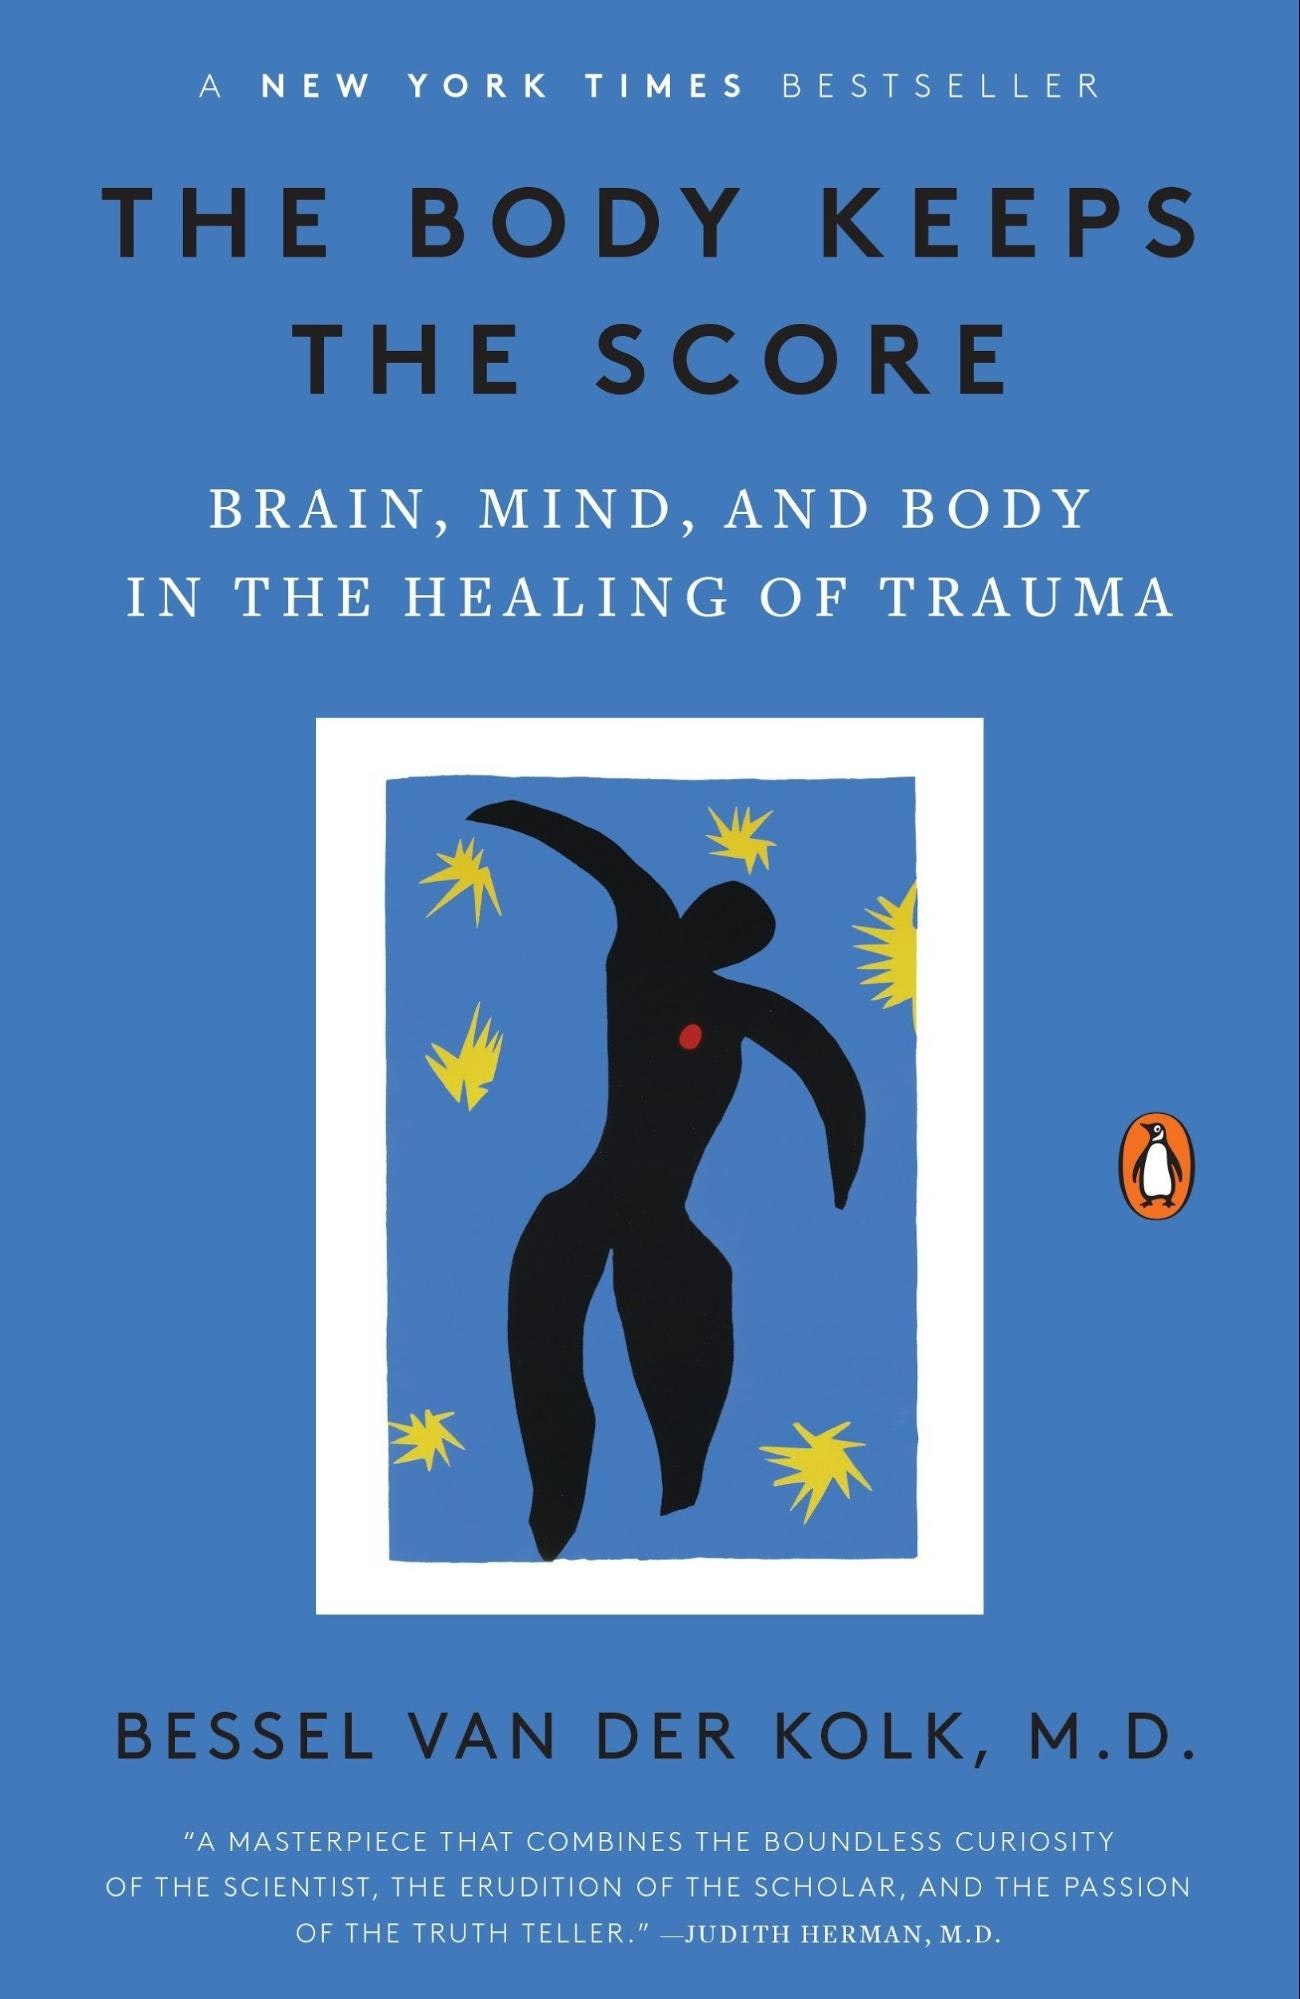 The Body Keeps the Score – Bessel Van Der Kolk, M.D.